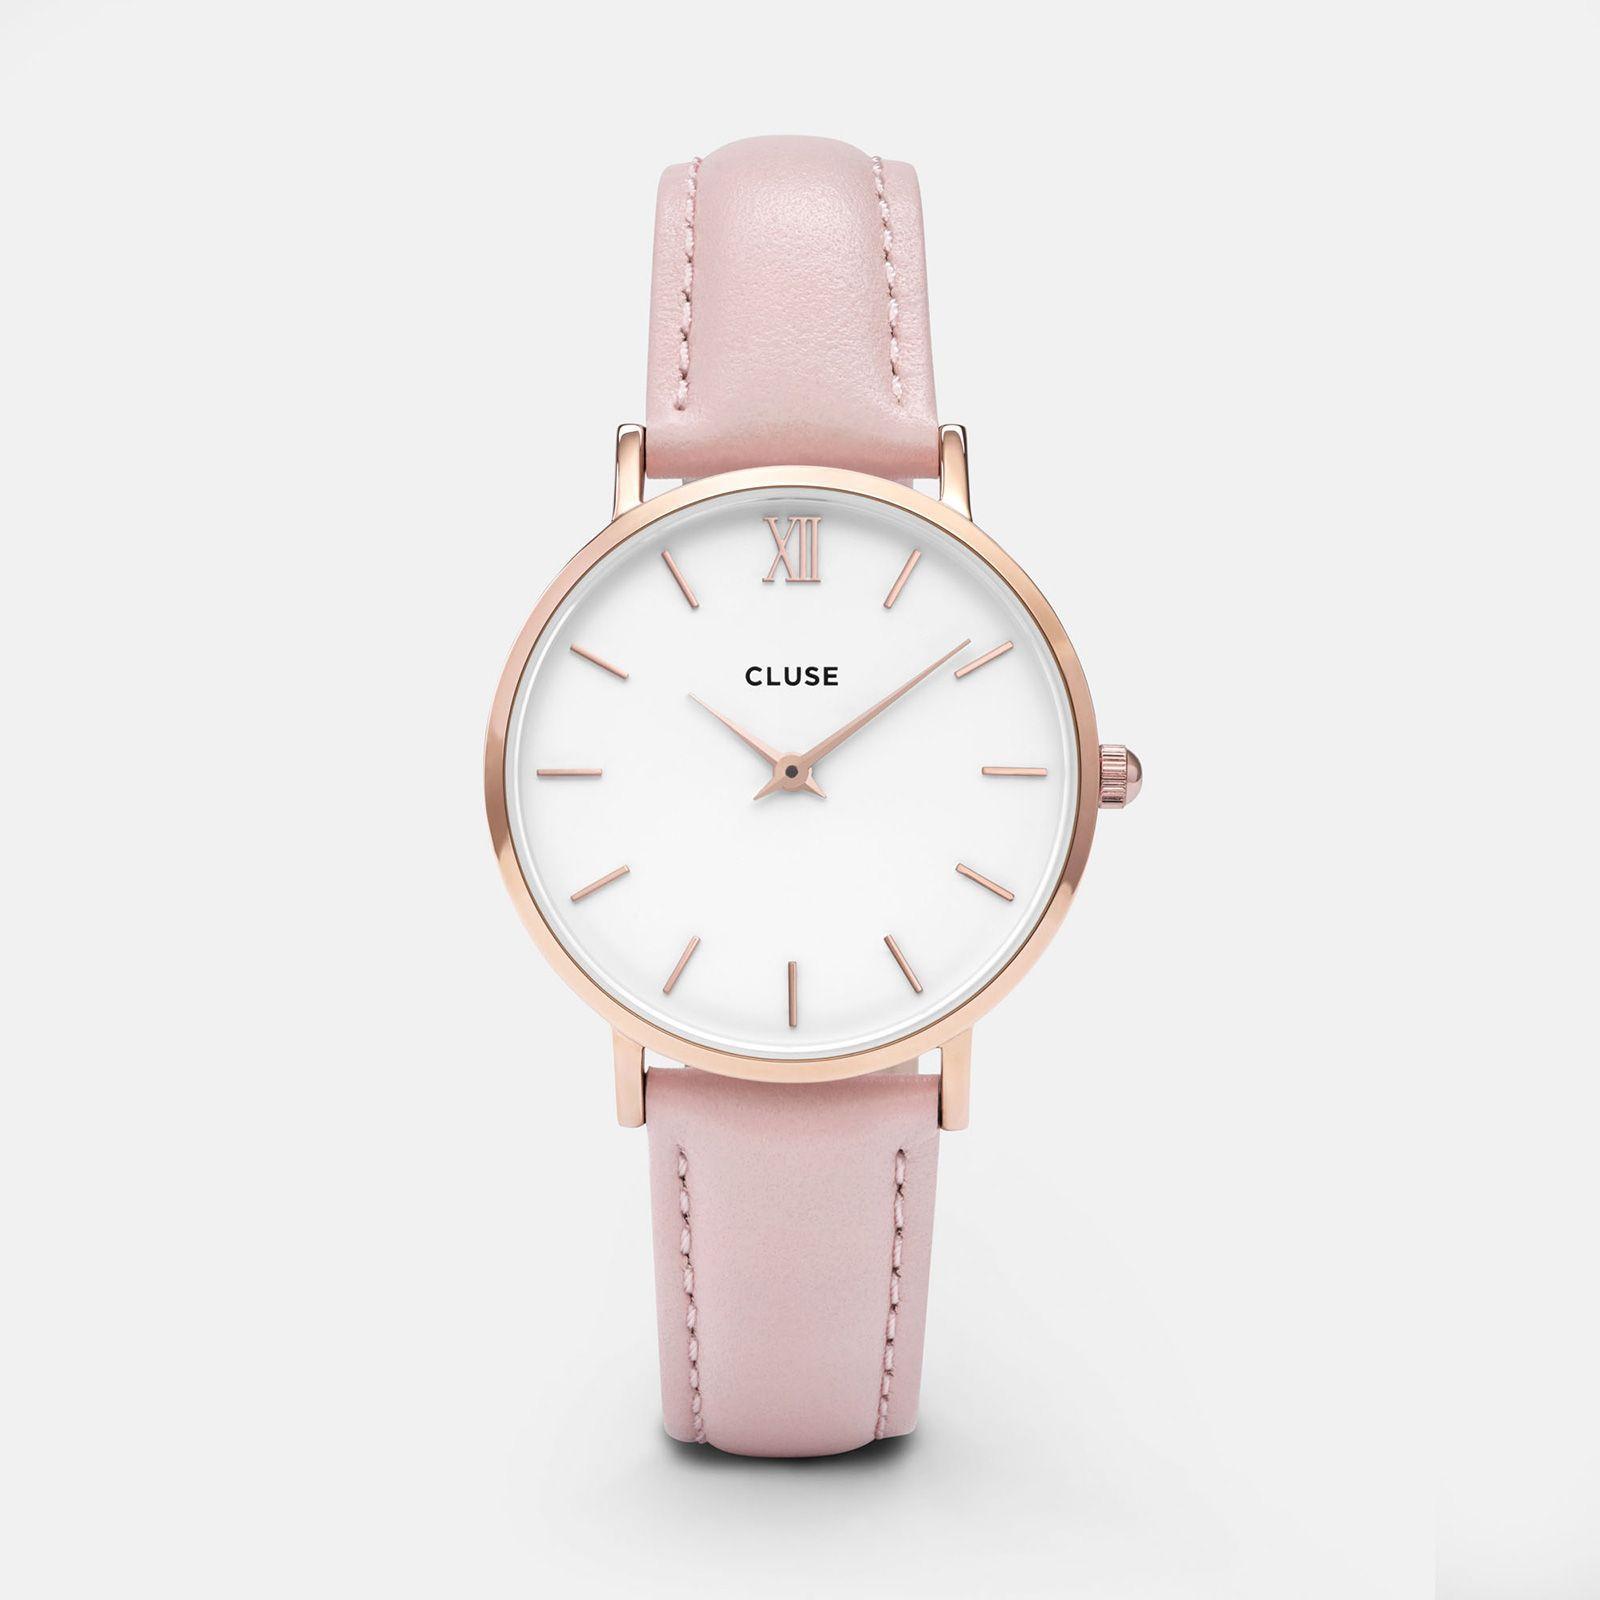 Minuit Rose Gold White Pink  b90eaebb6a35